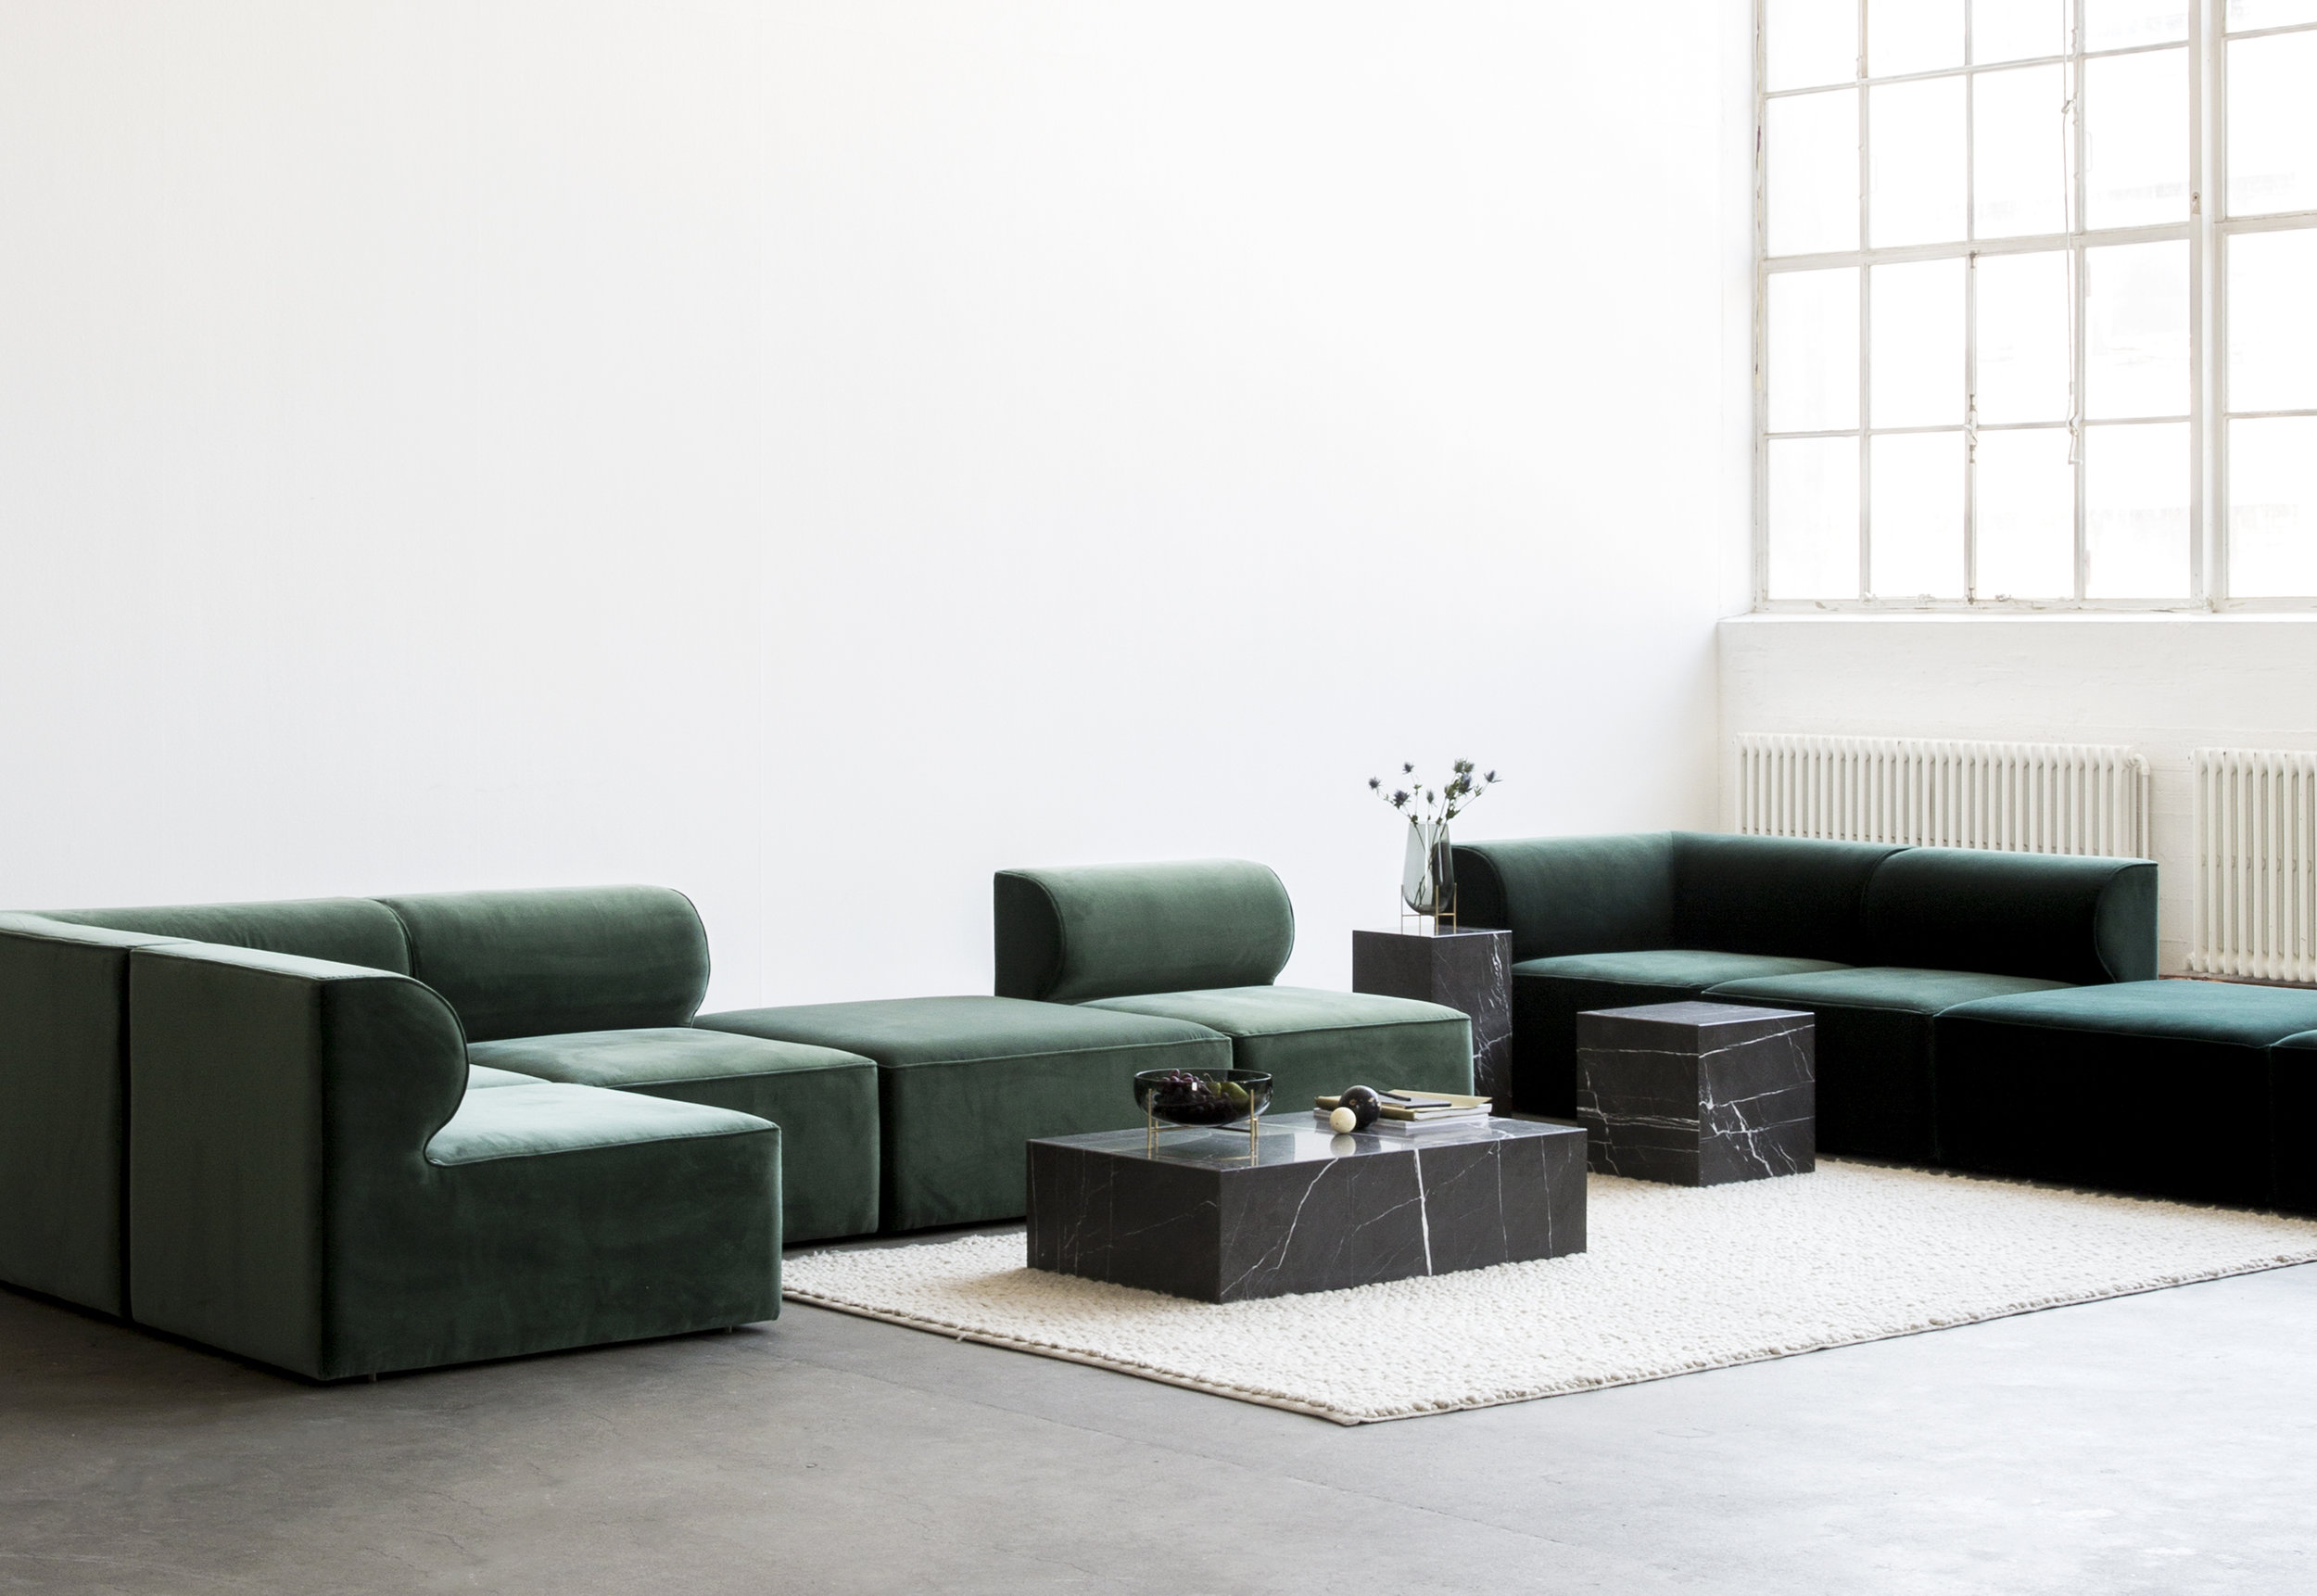 MENU Eave Sofa, interiors, modern furniture living room space 1.jpg